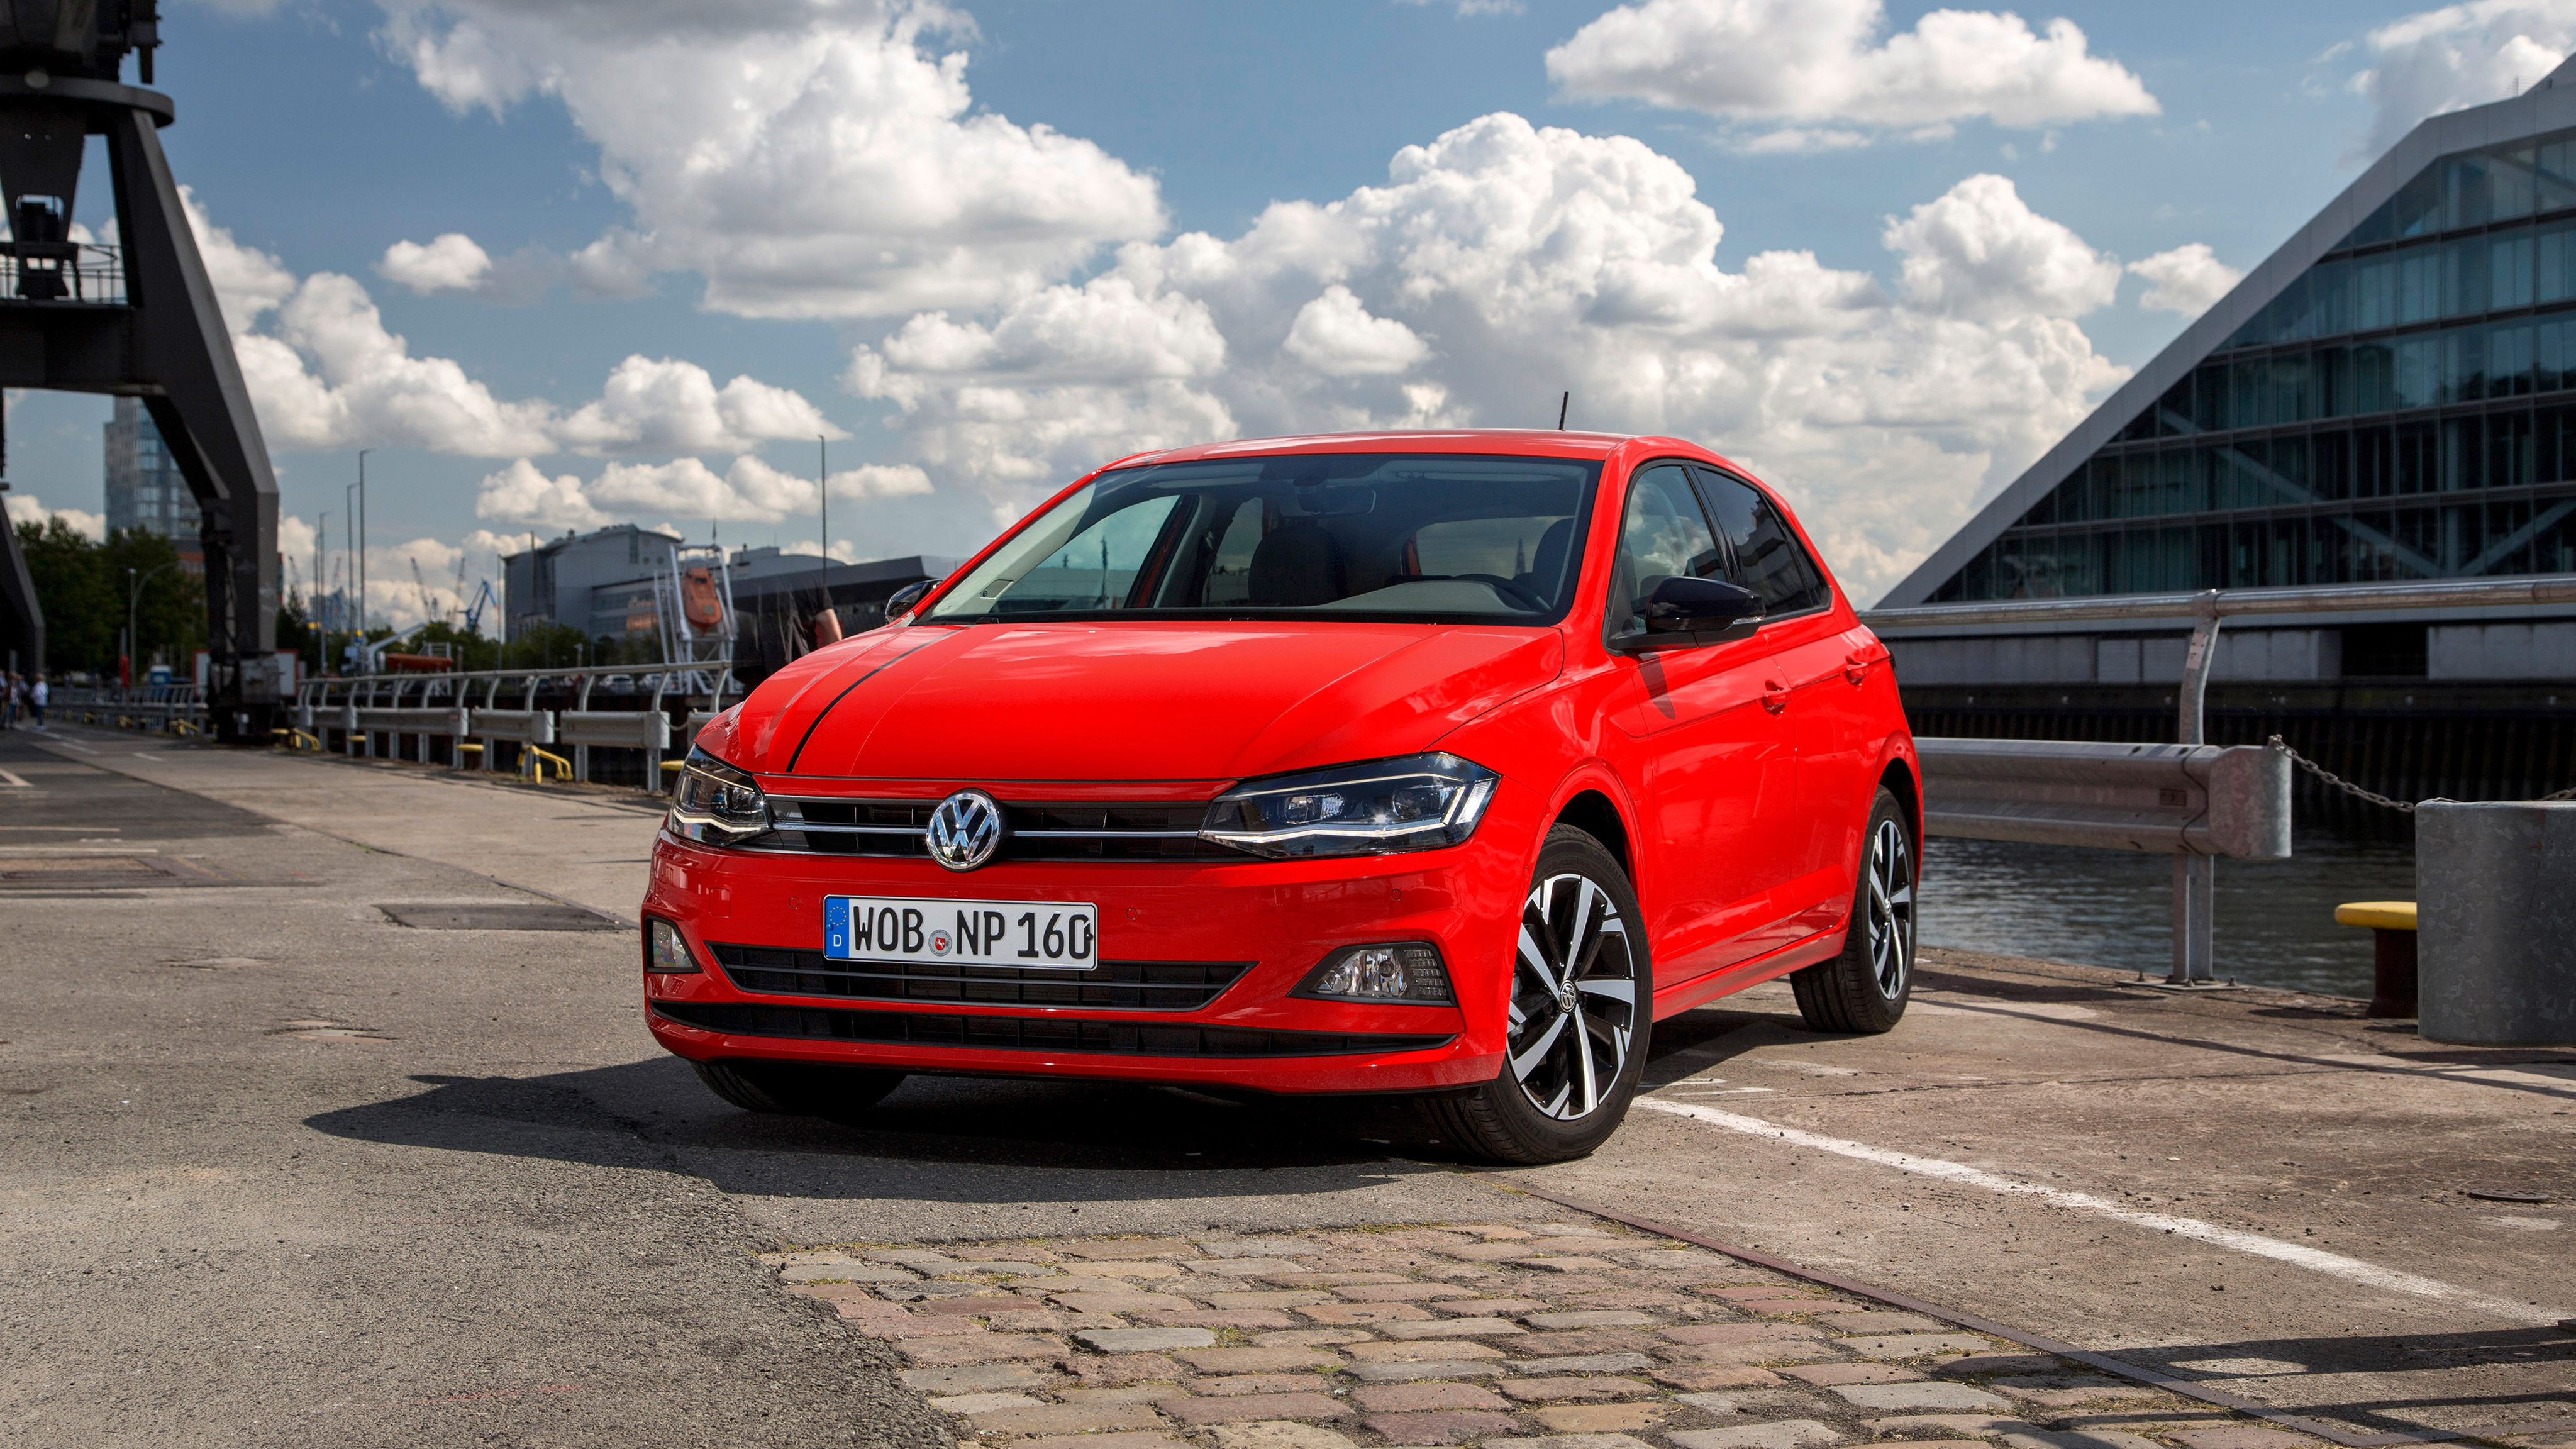 2017 Volkswagen Polo Beats 4k Wallpaper Hd Car Wallpapers Id 8783